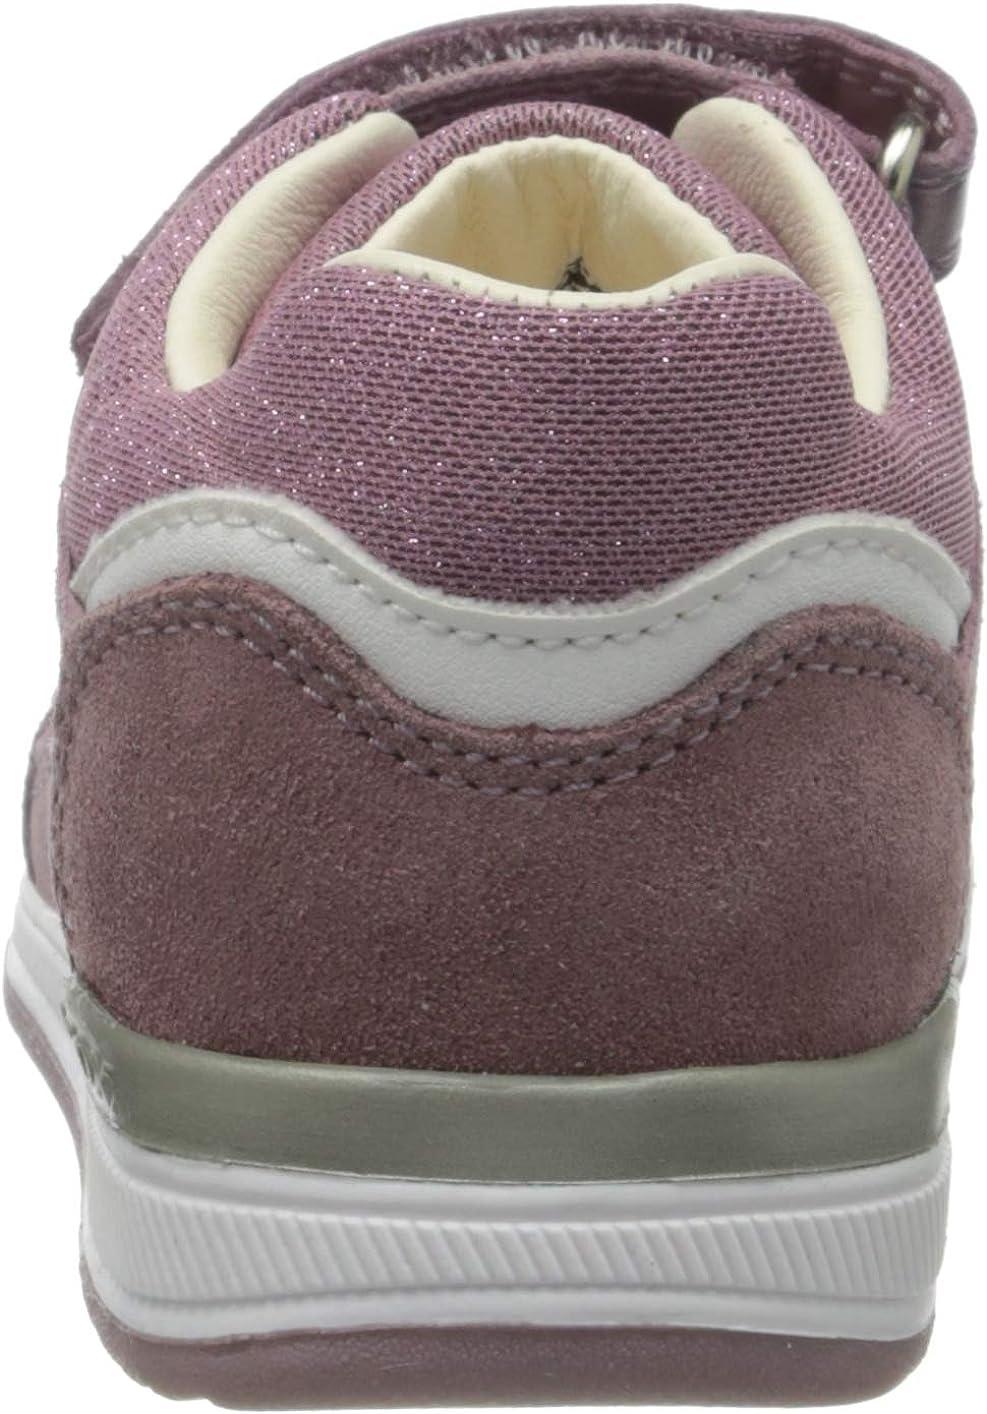 Sneakers Basses B/éb/é Fille 18 EU White//Silver C0007 Blanc Geox B RISHON Girl A